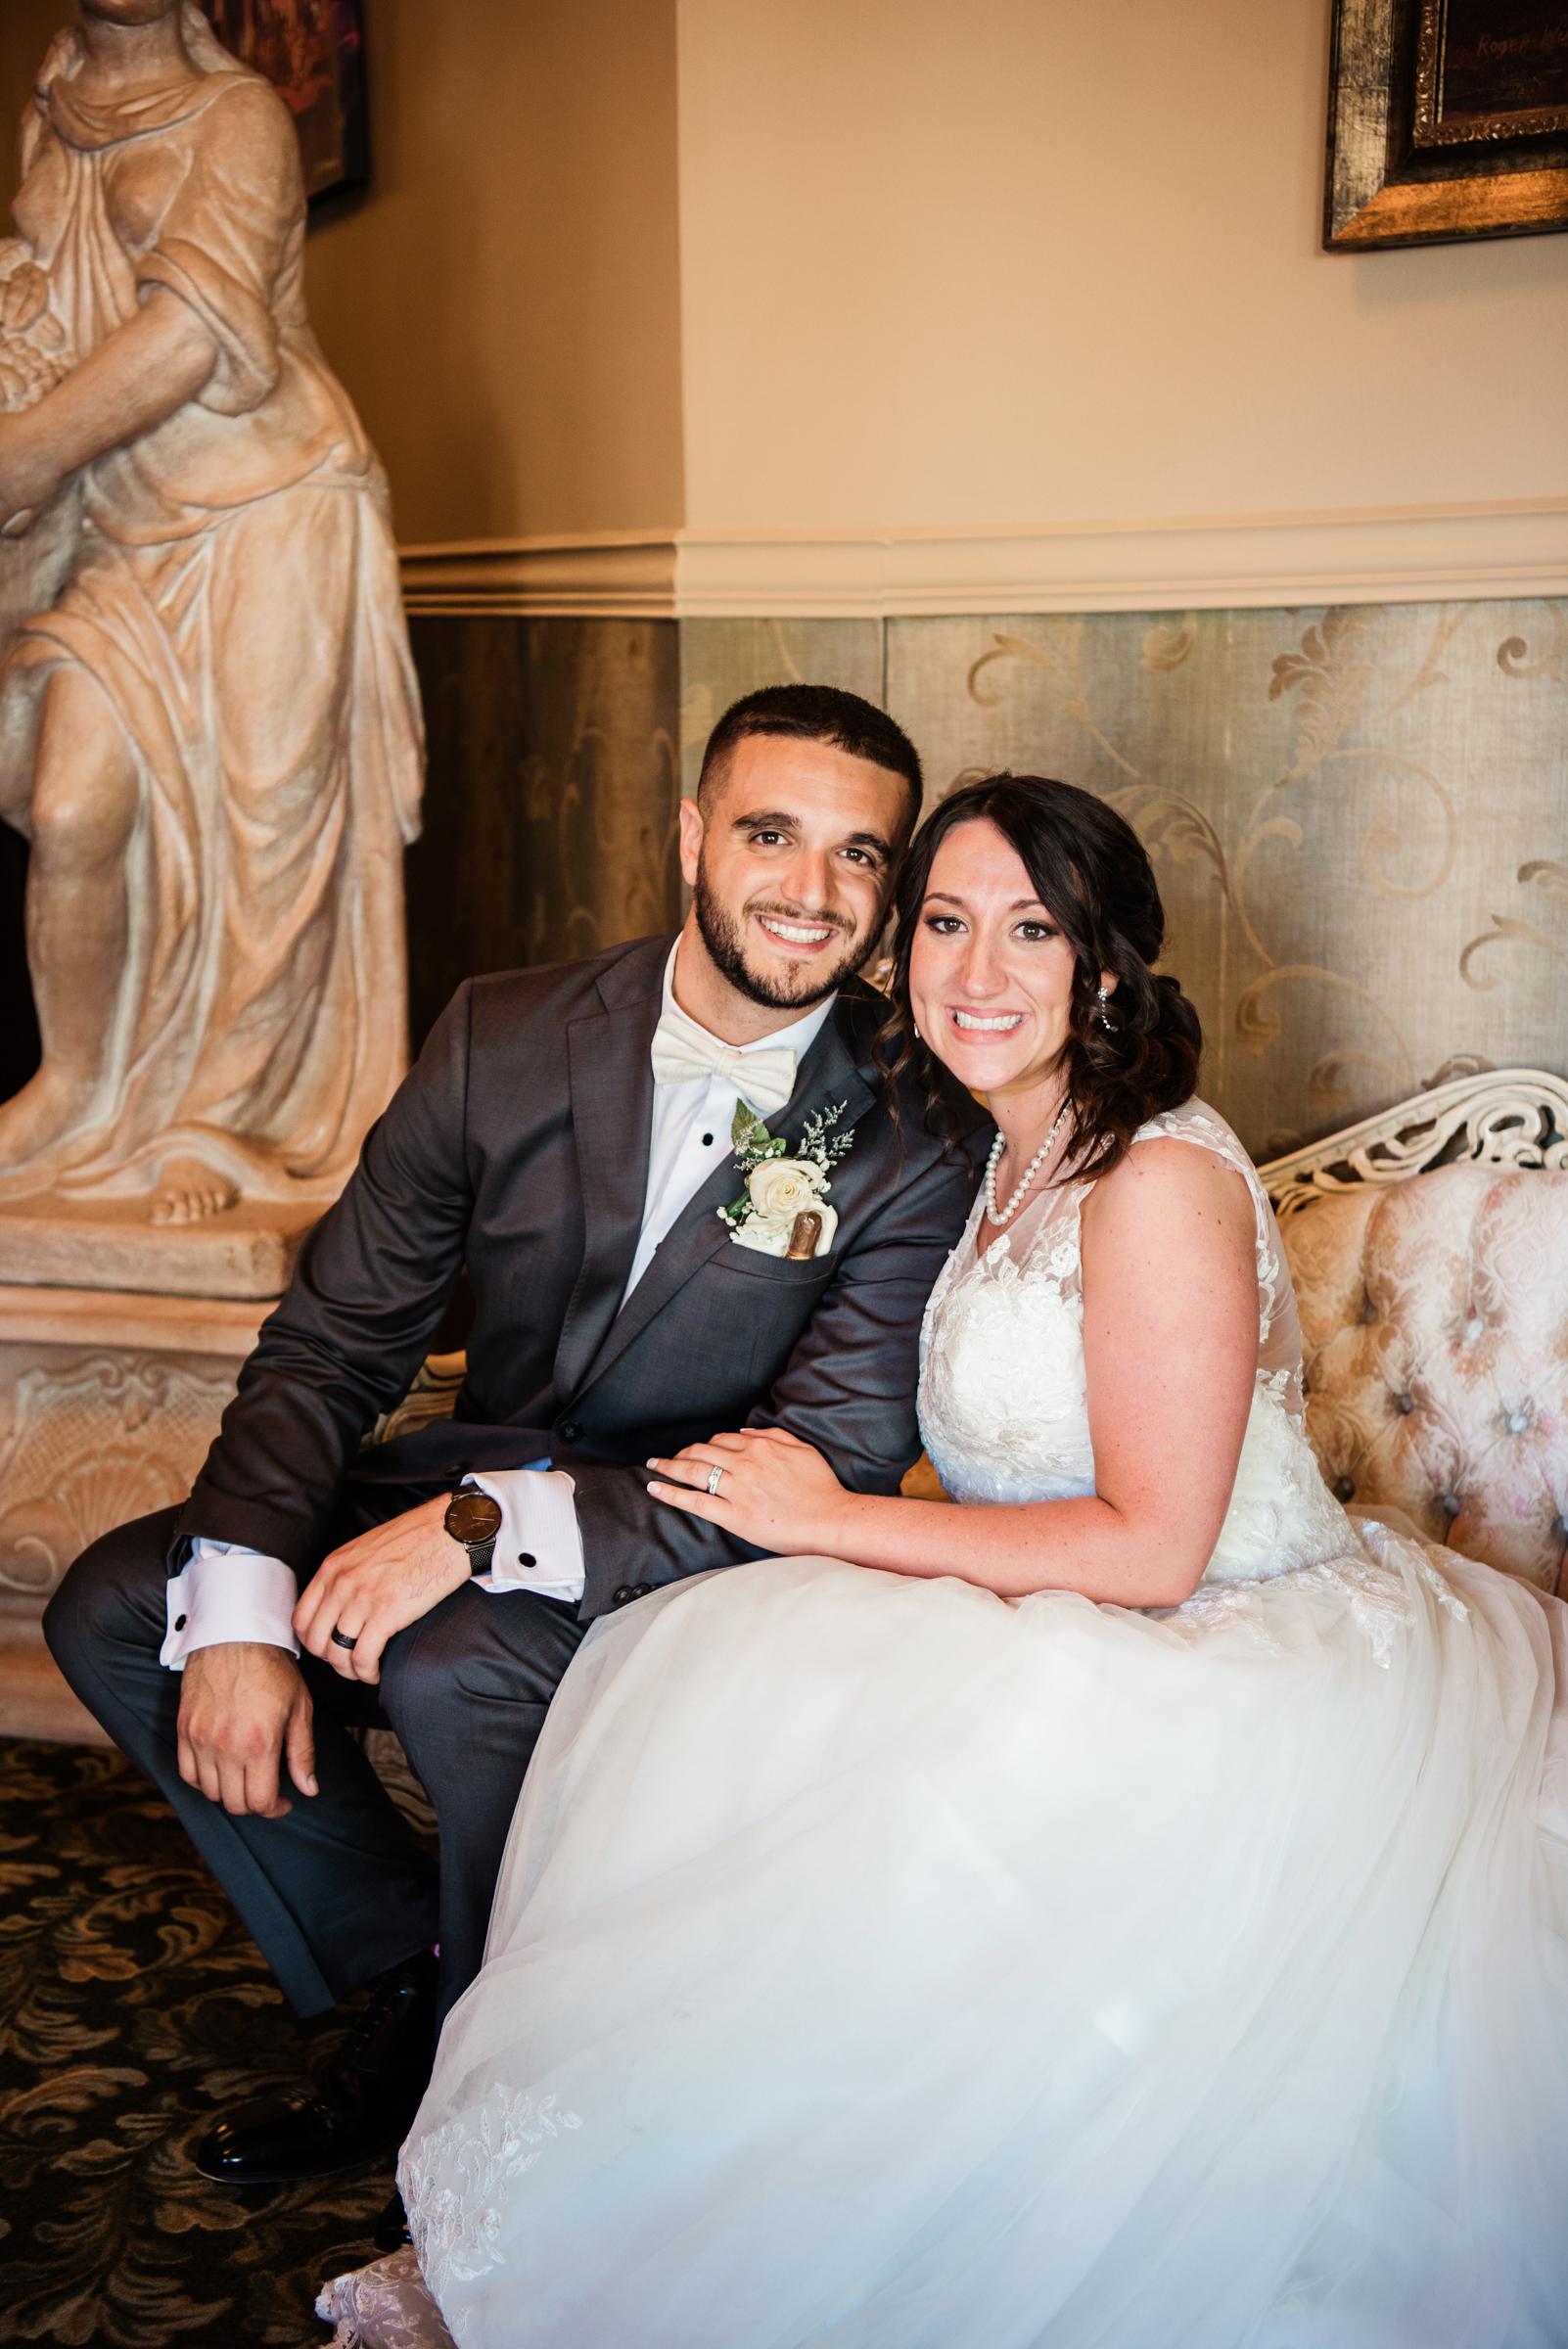 Historic_Old_St_Johns_Church_Valentinos_Banquet_Hall_Central_NY_Wedding_JILL_STUDIO_Rochester_NY_Photographer_DSC_6551.jpg